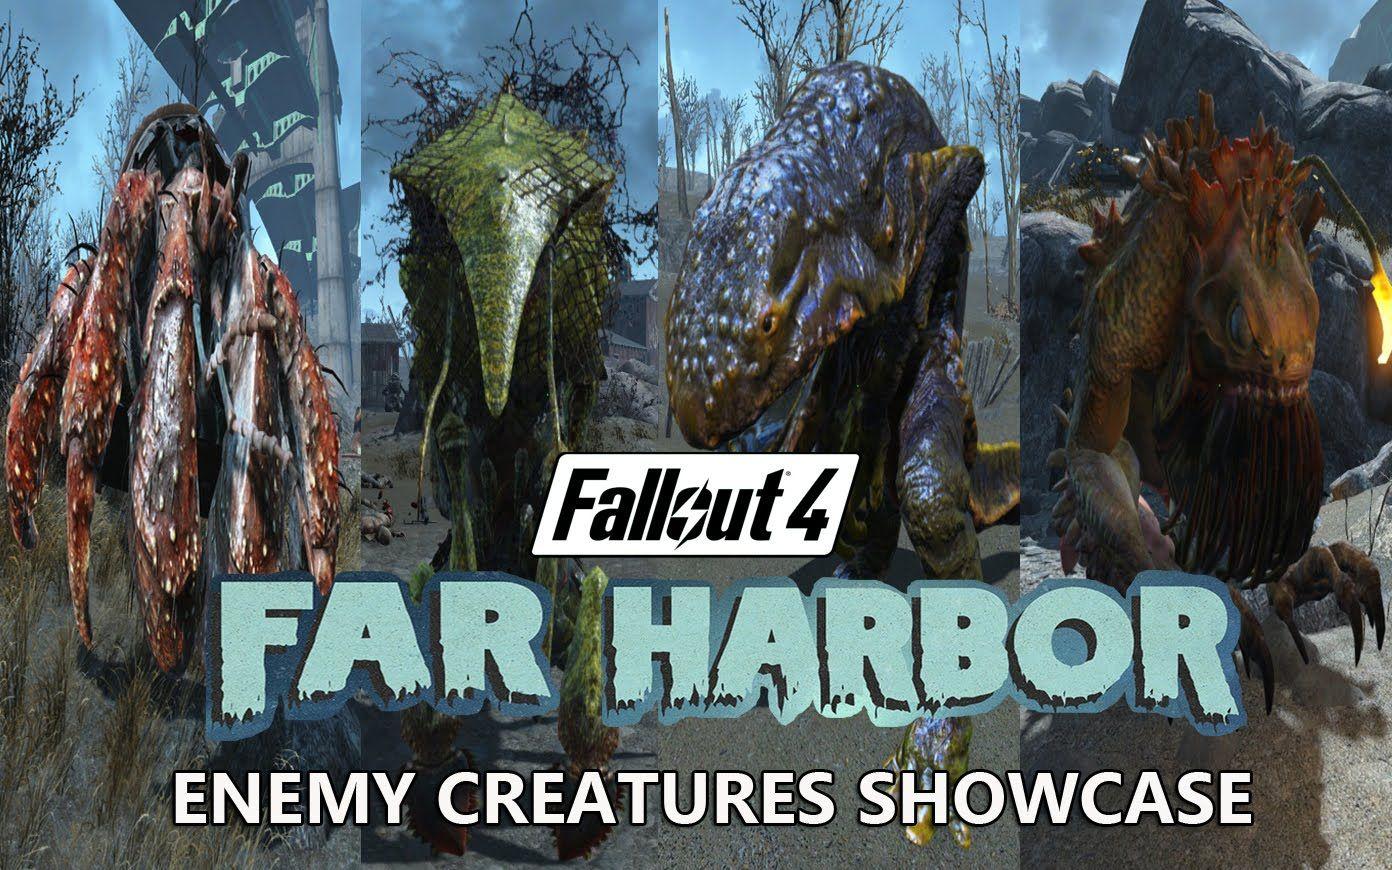 Far Harbor Enemy Creature Showcase - Fallout 4 | fallout